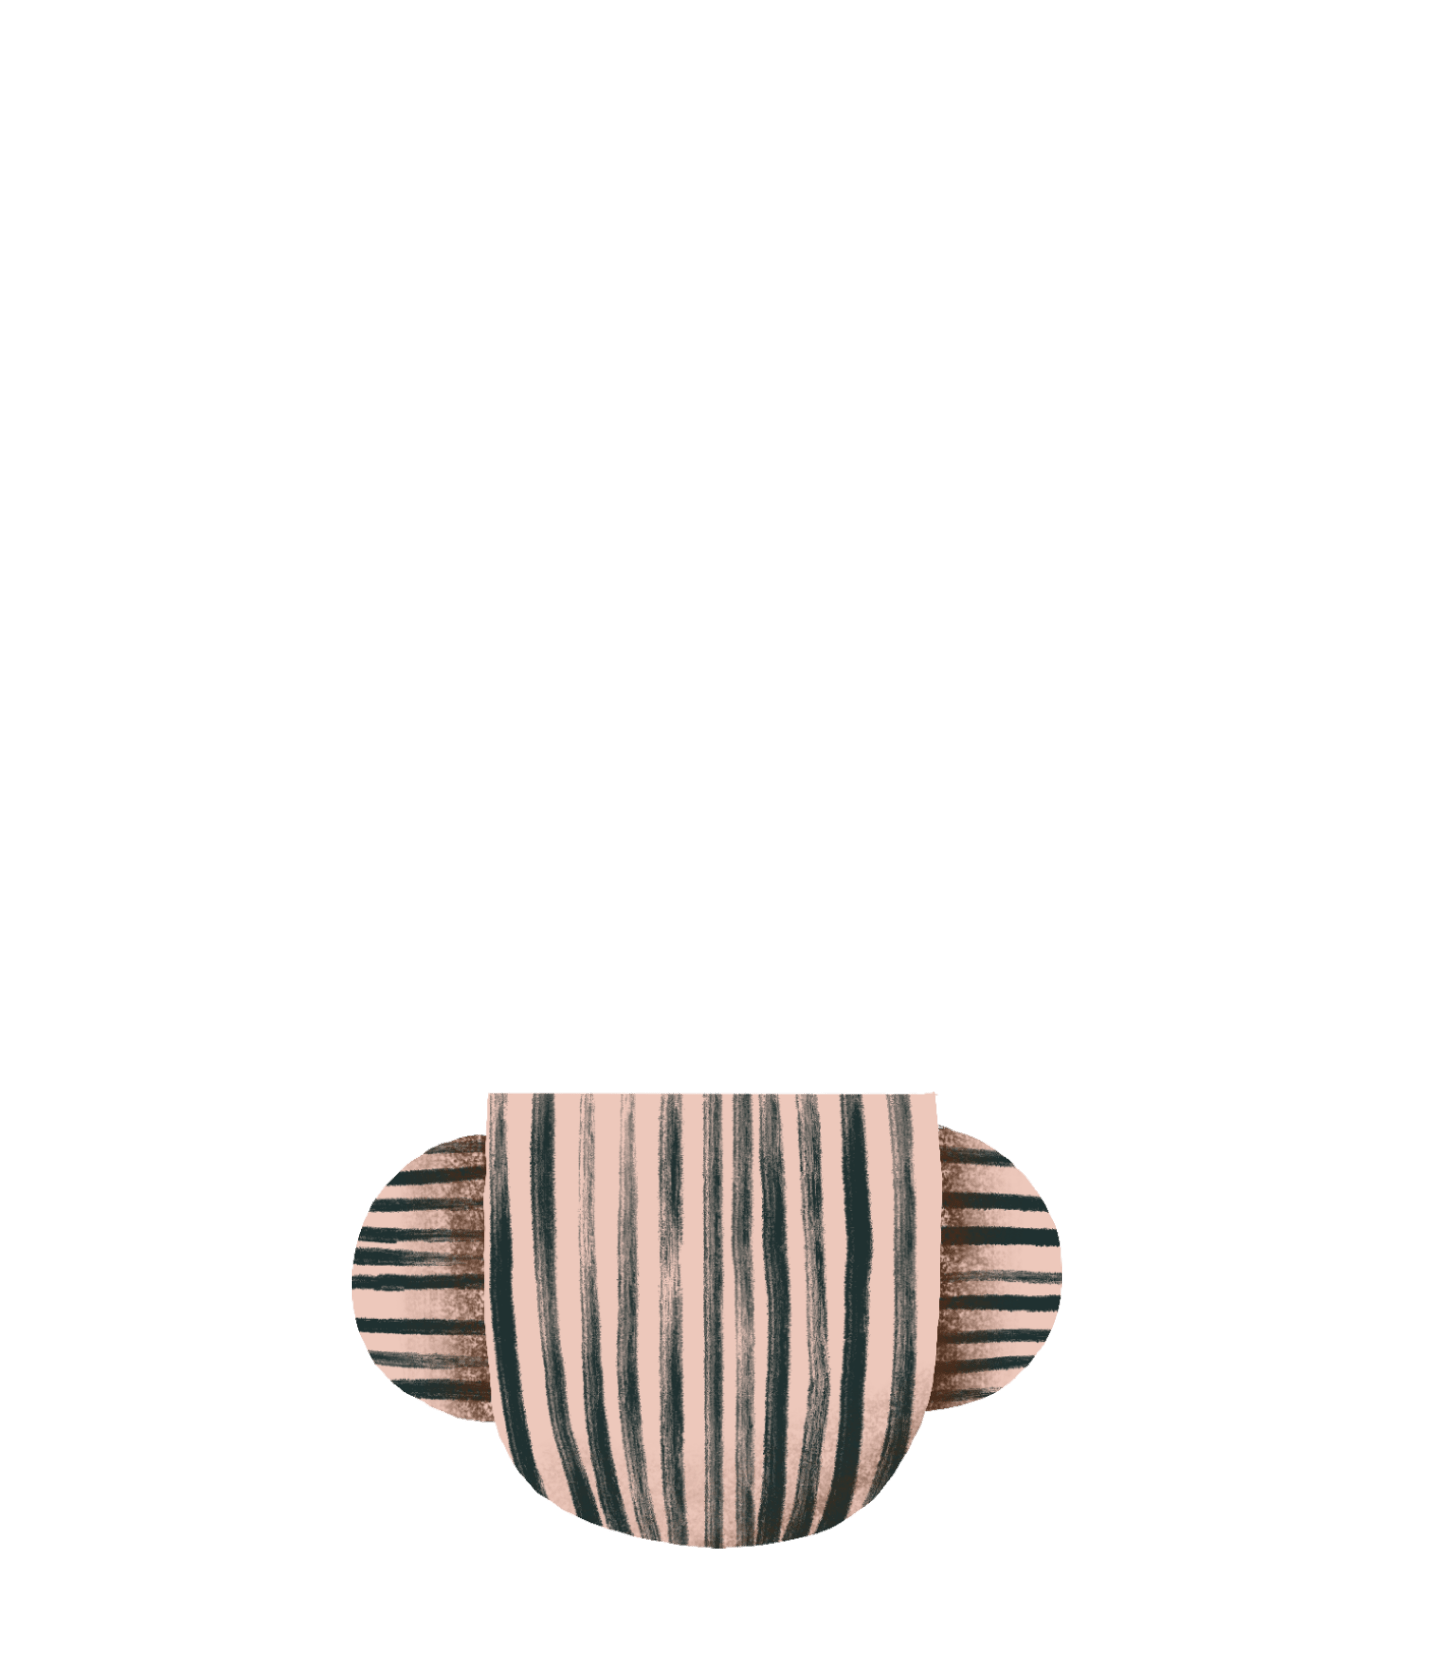 calathea medallion pot